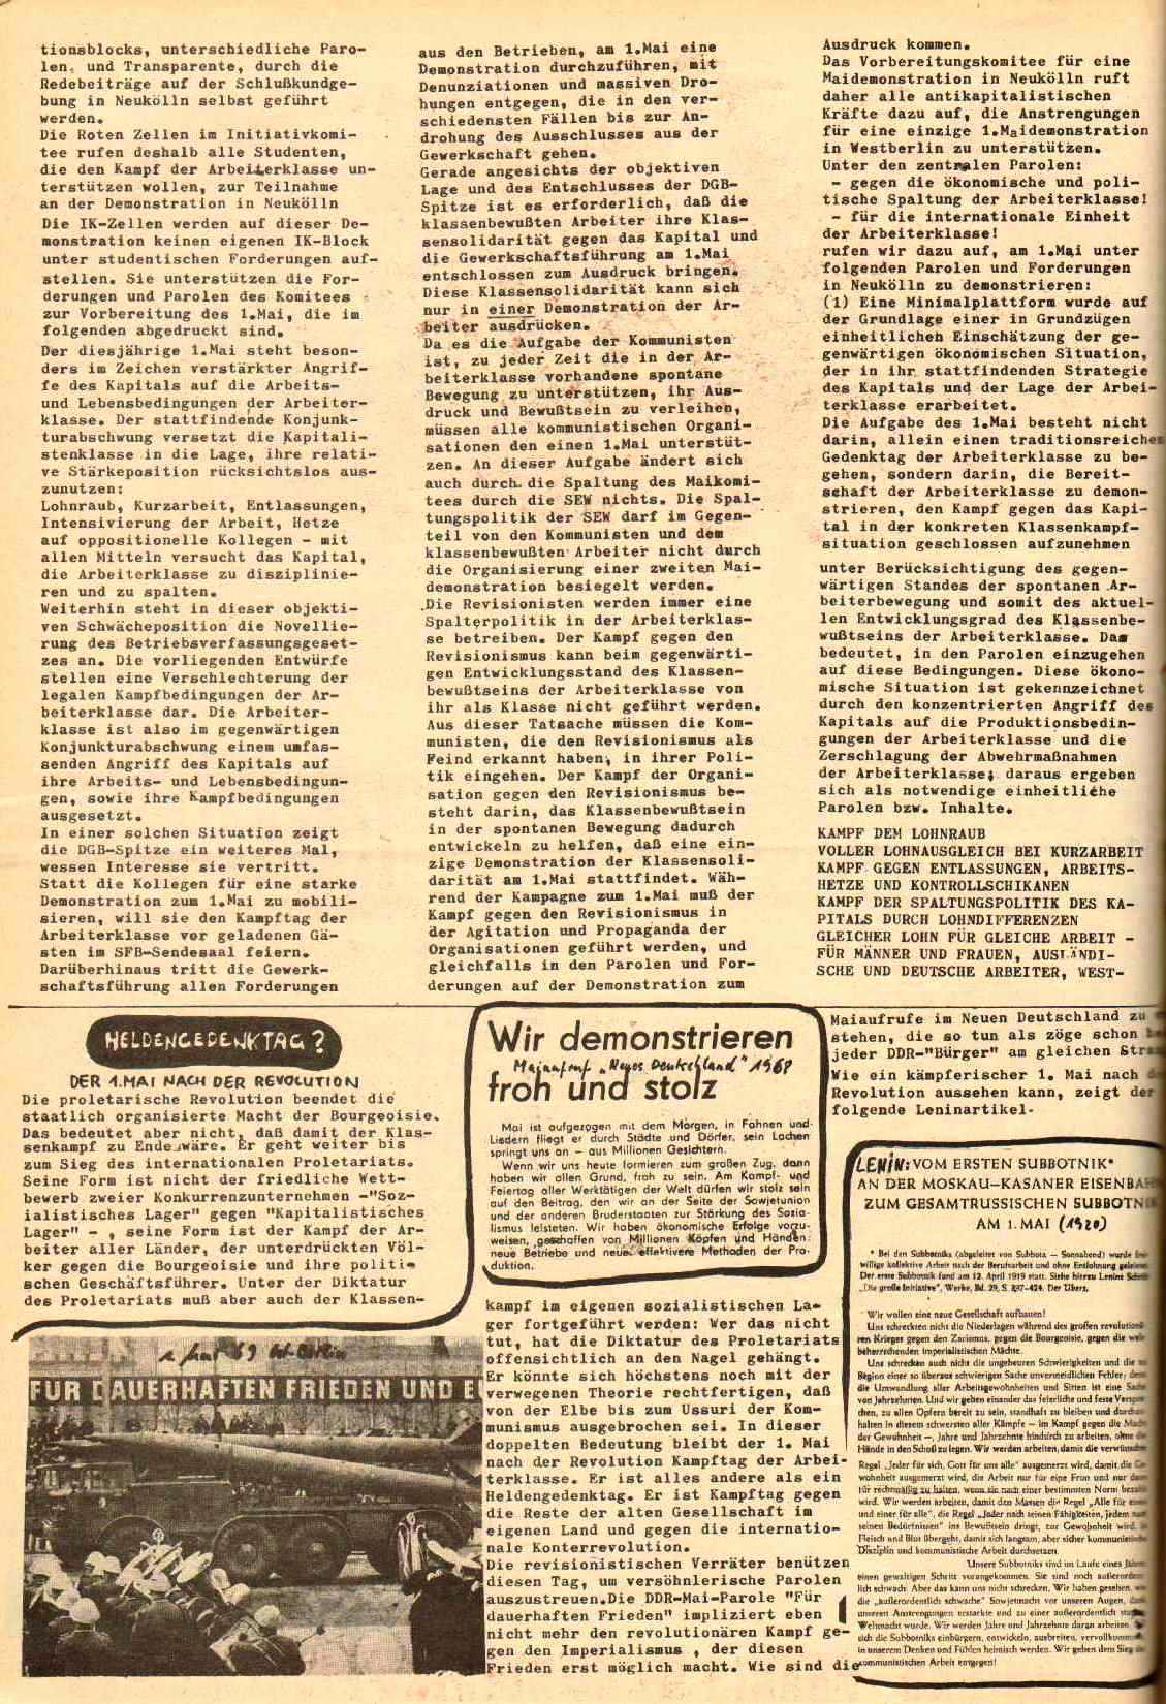 Berlin_Hochschulkampf_1971_07_02